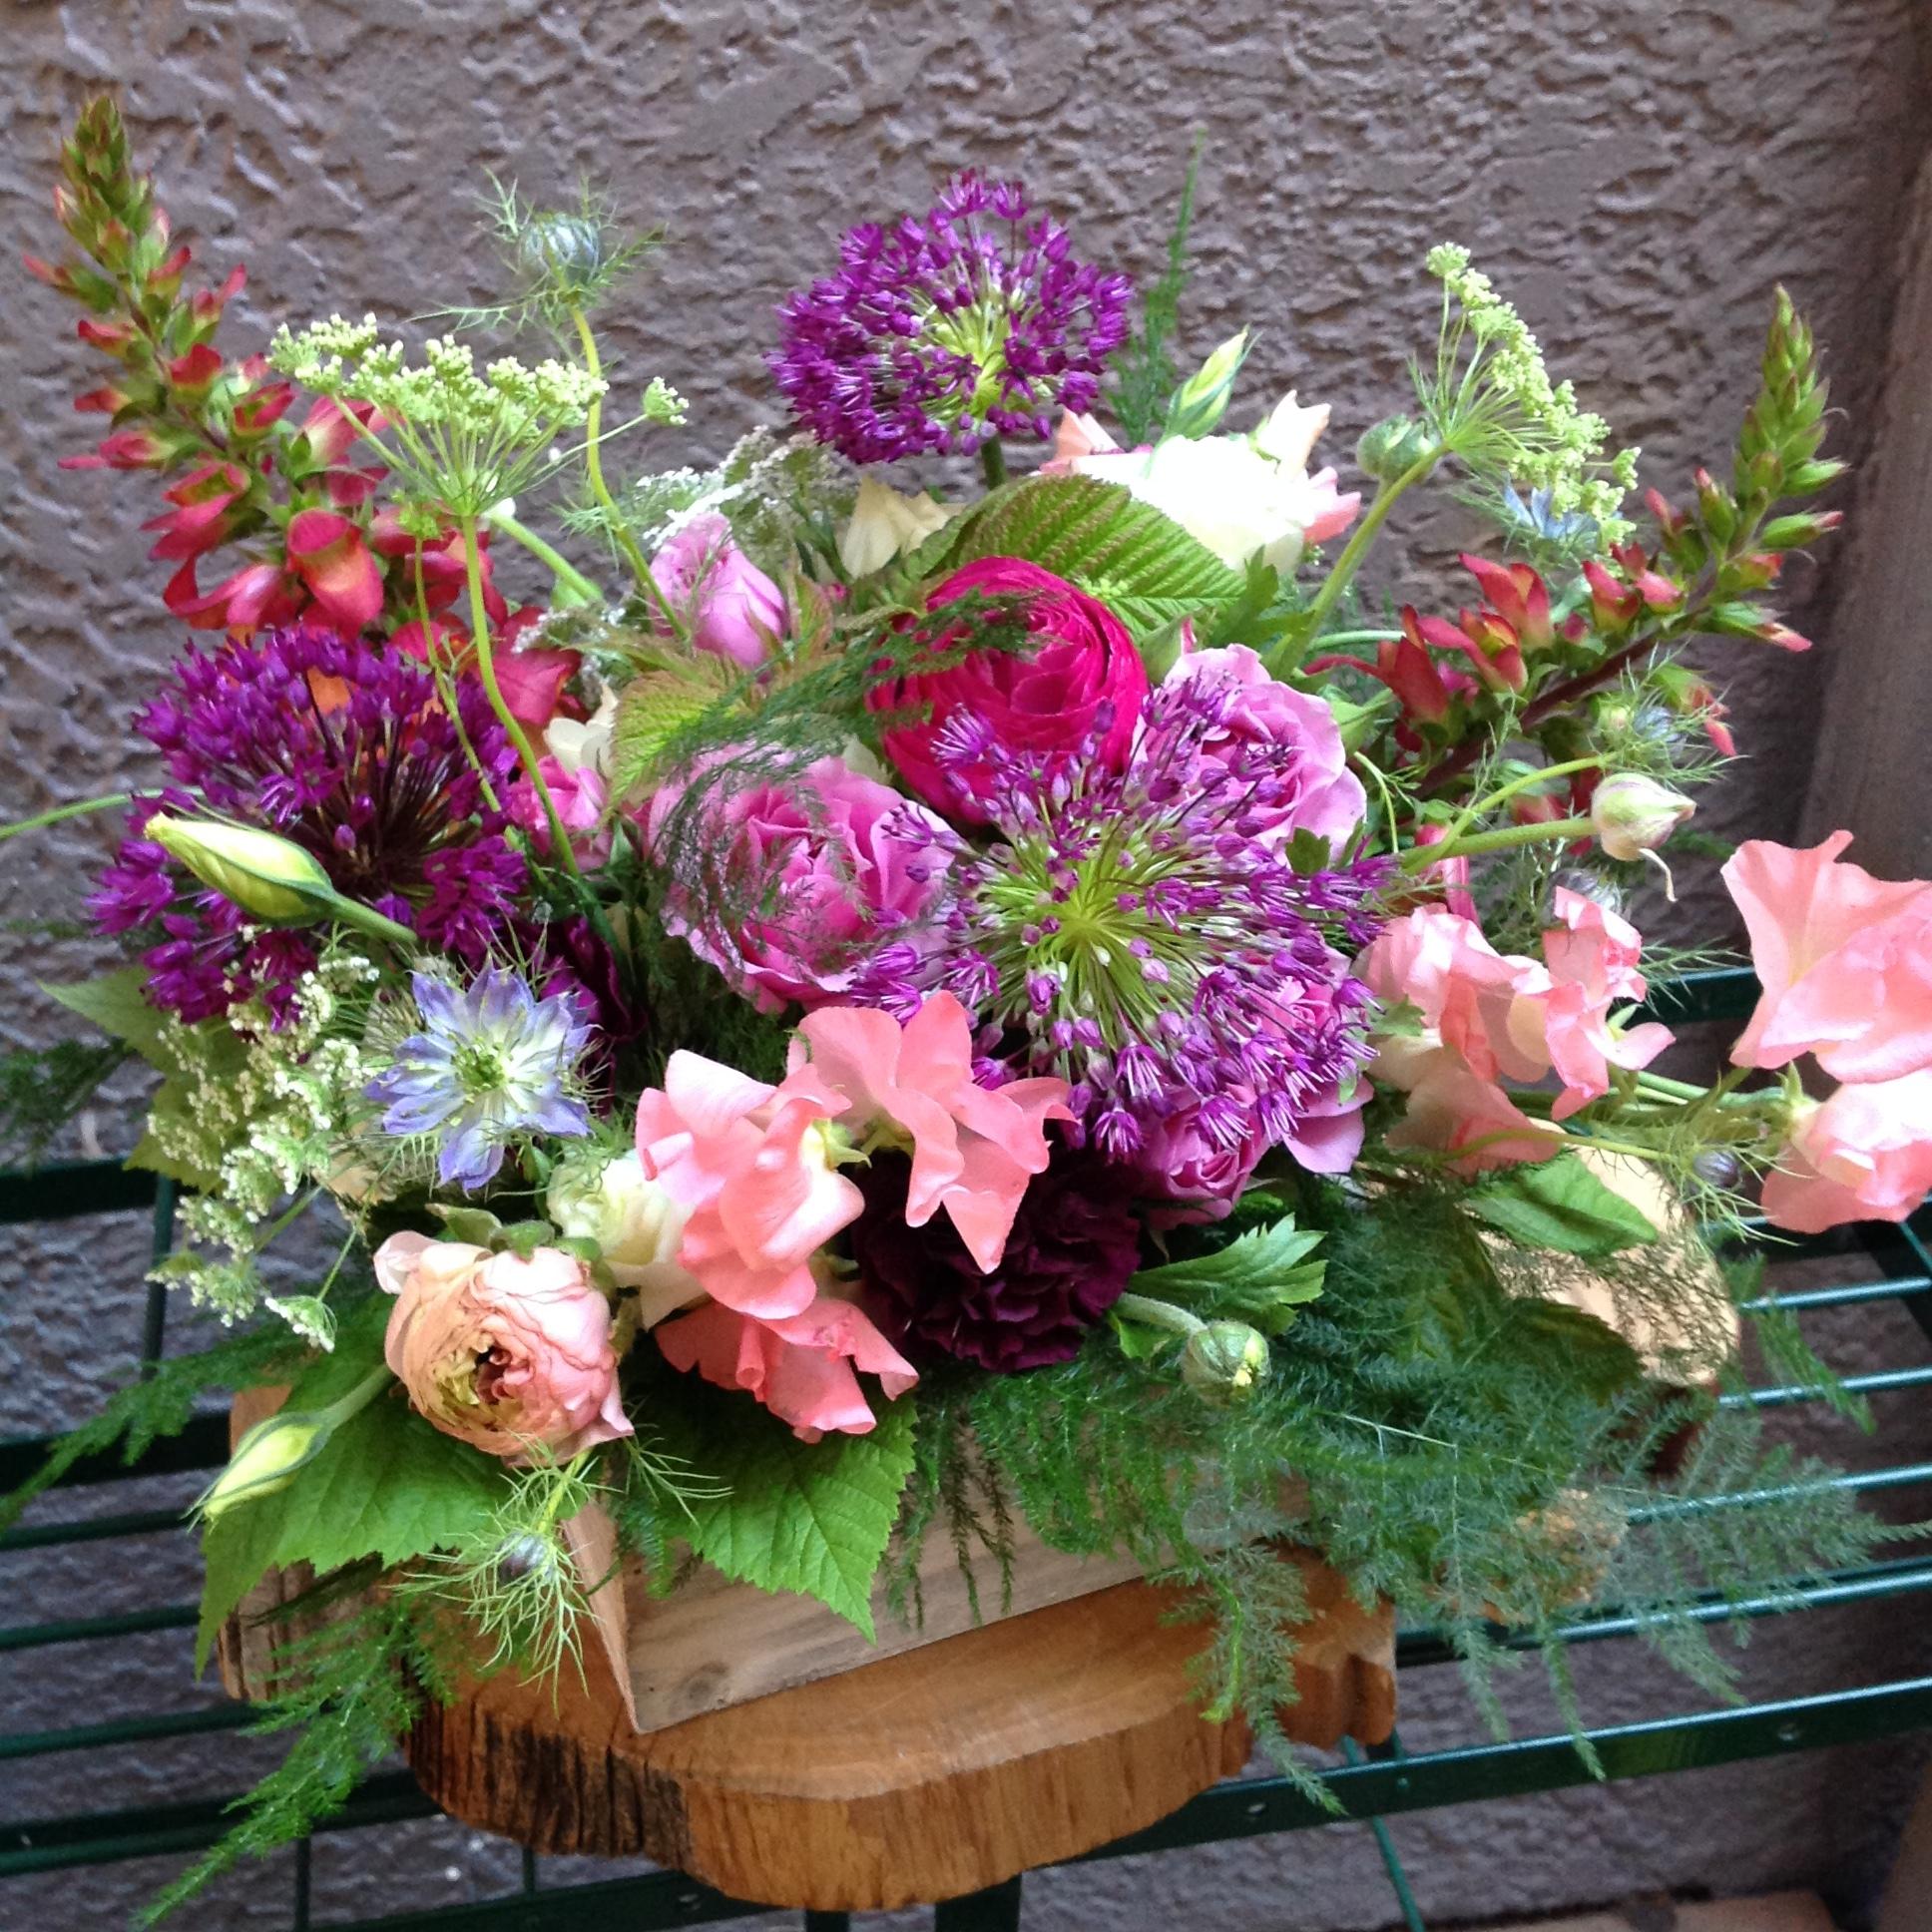 Fragrant Spring Garden Arrangement in Wooden Box